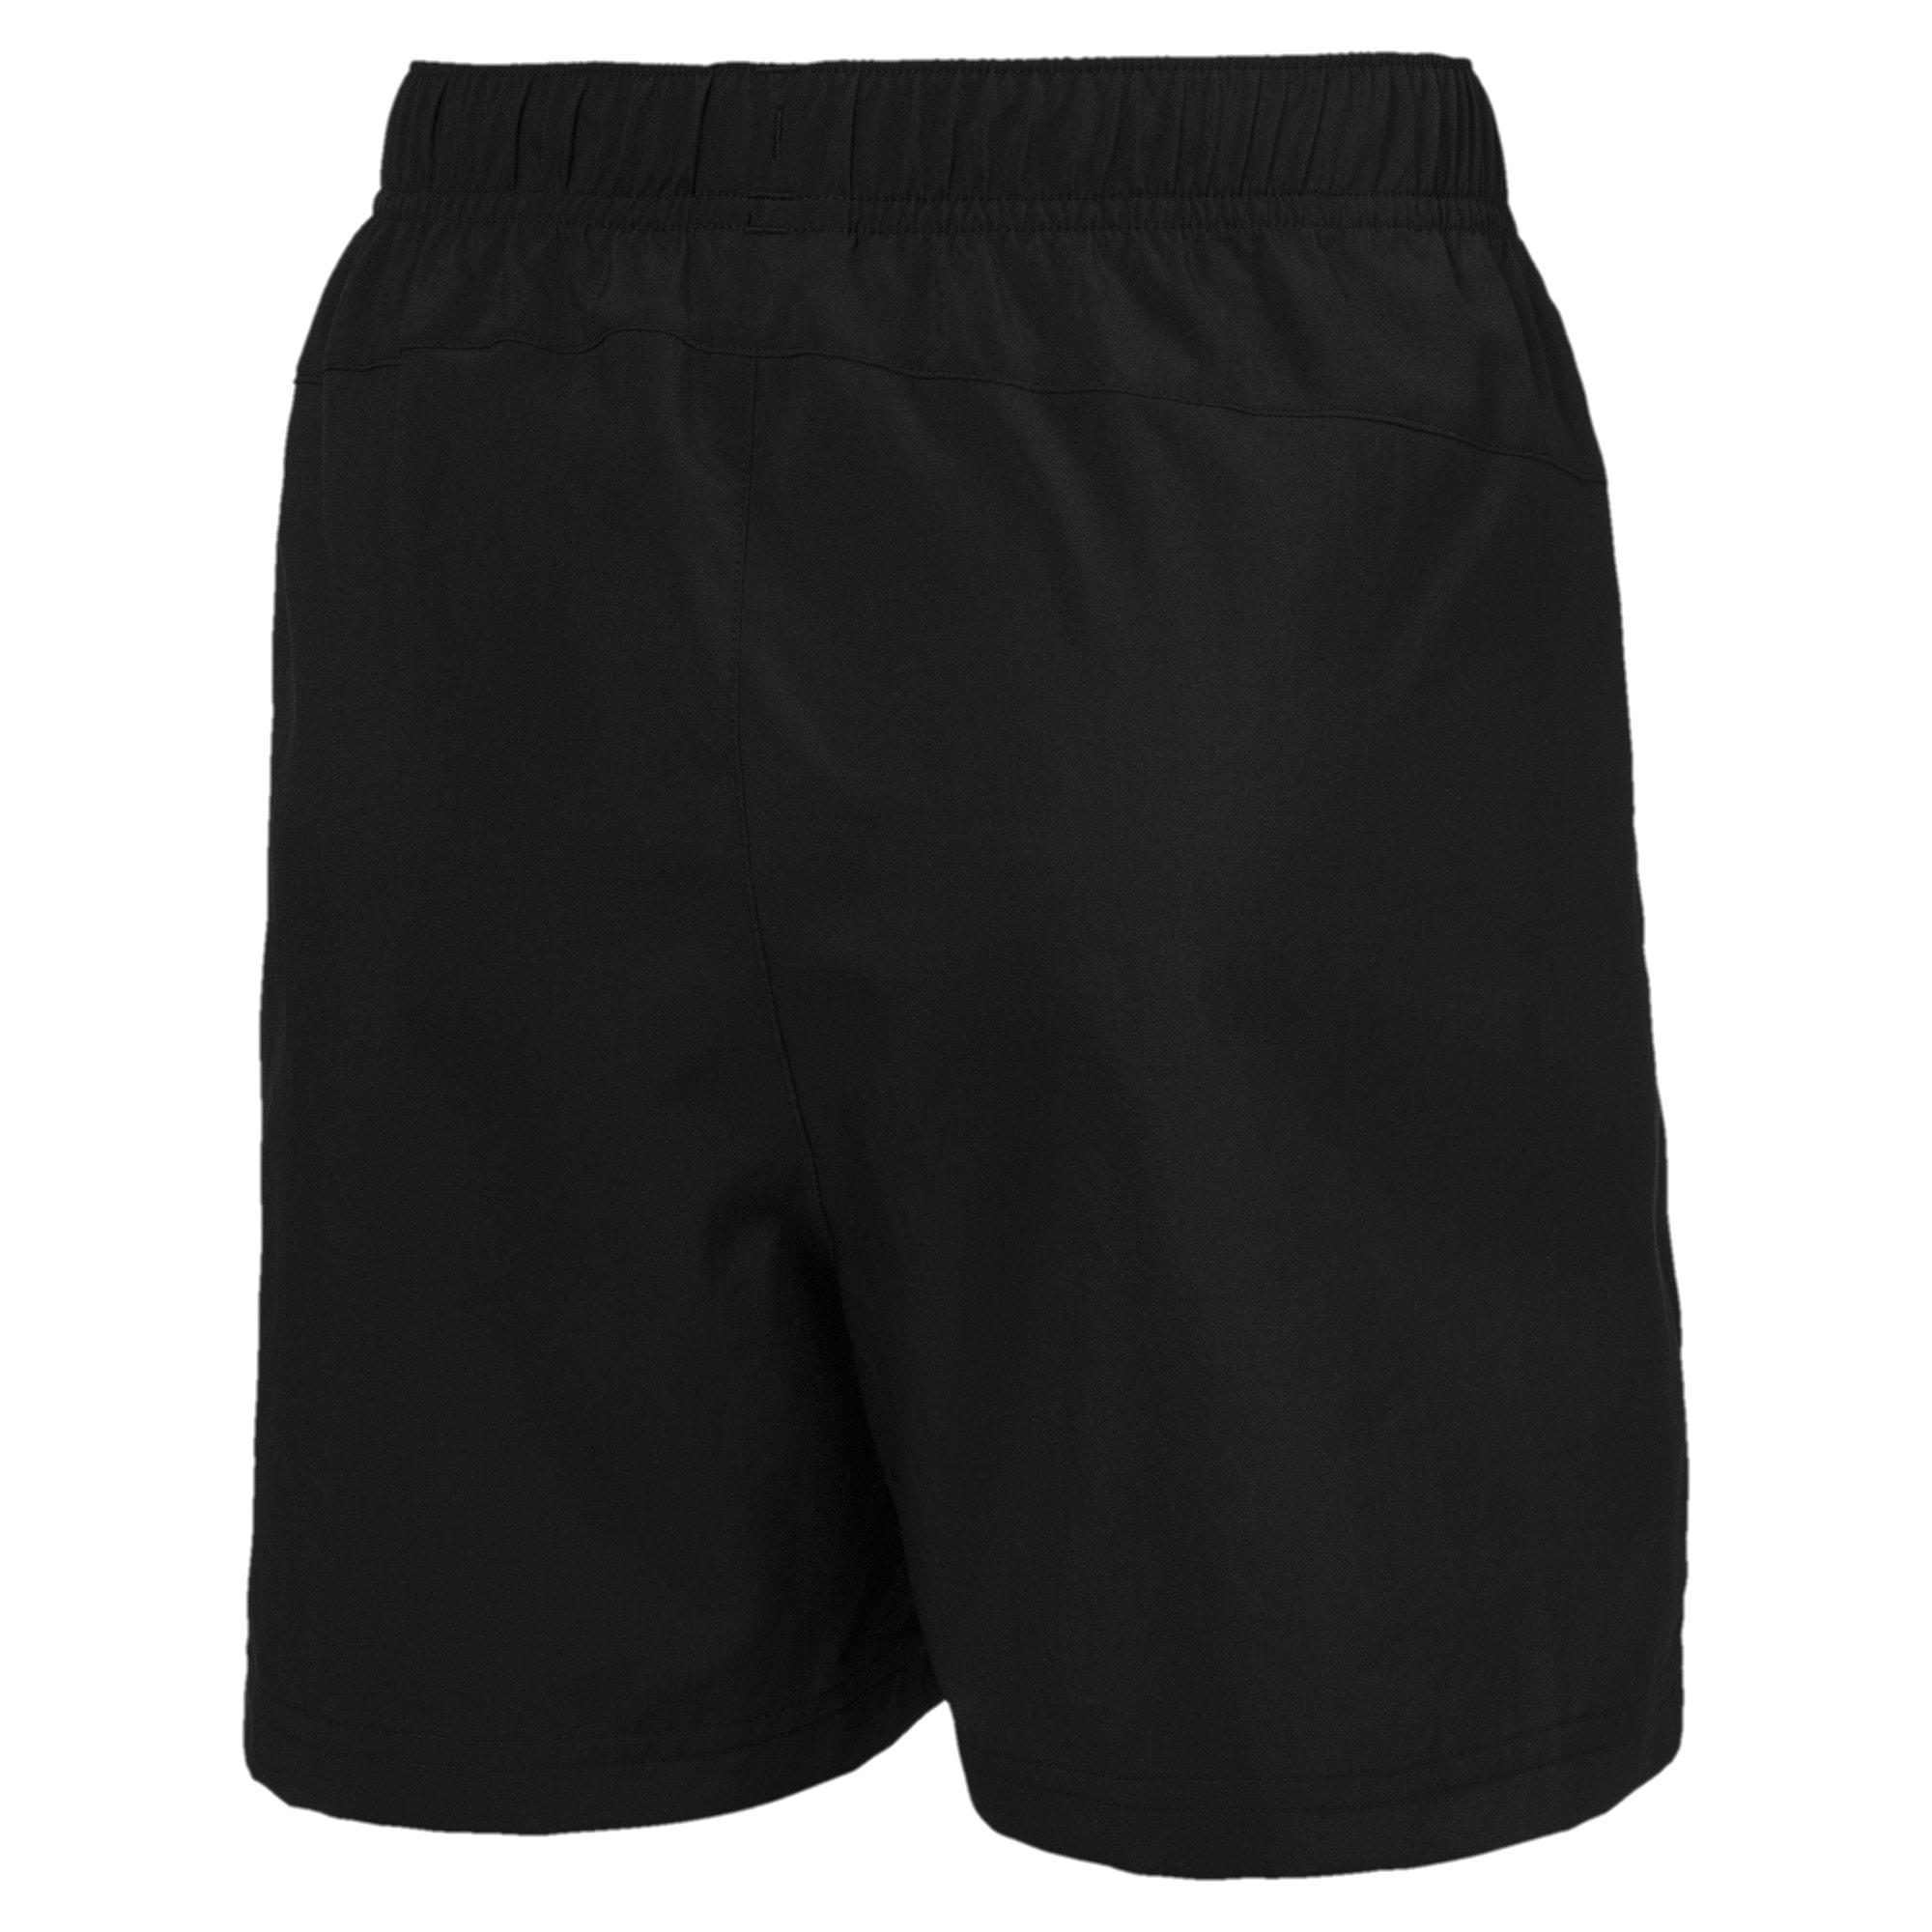 Thumbnail 2 of Active Woven Boys' Short, Puma Black, medium-IND